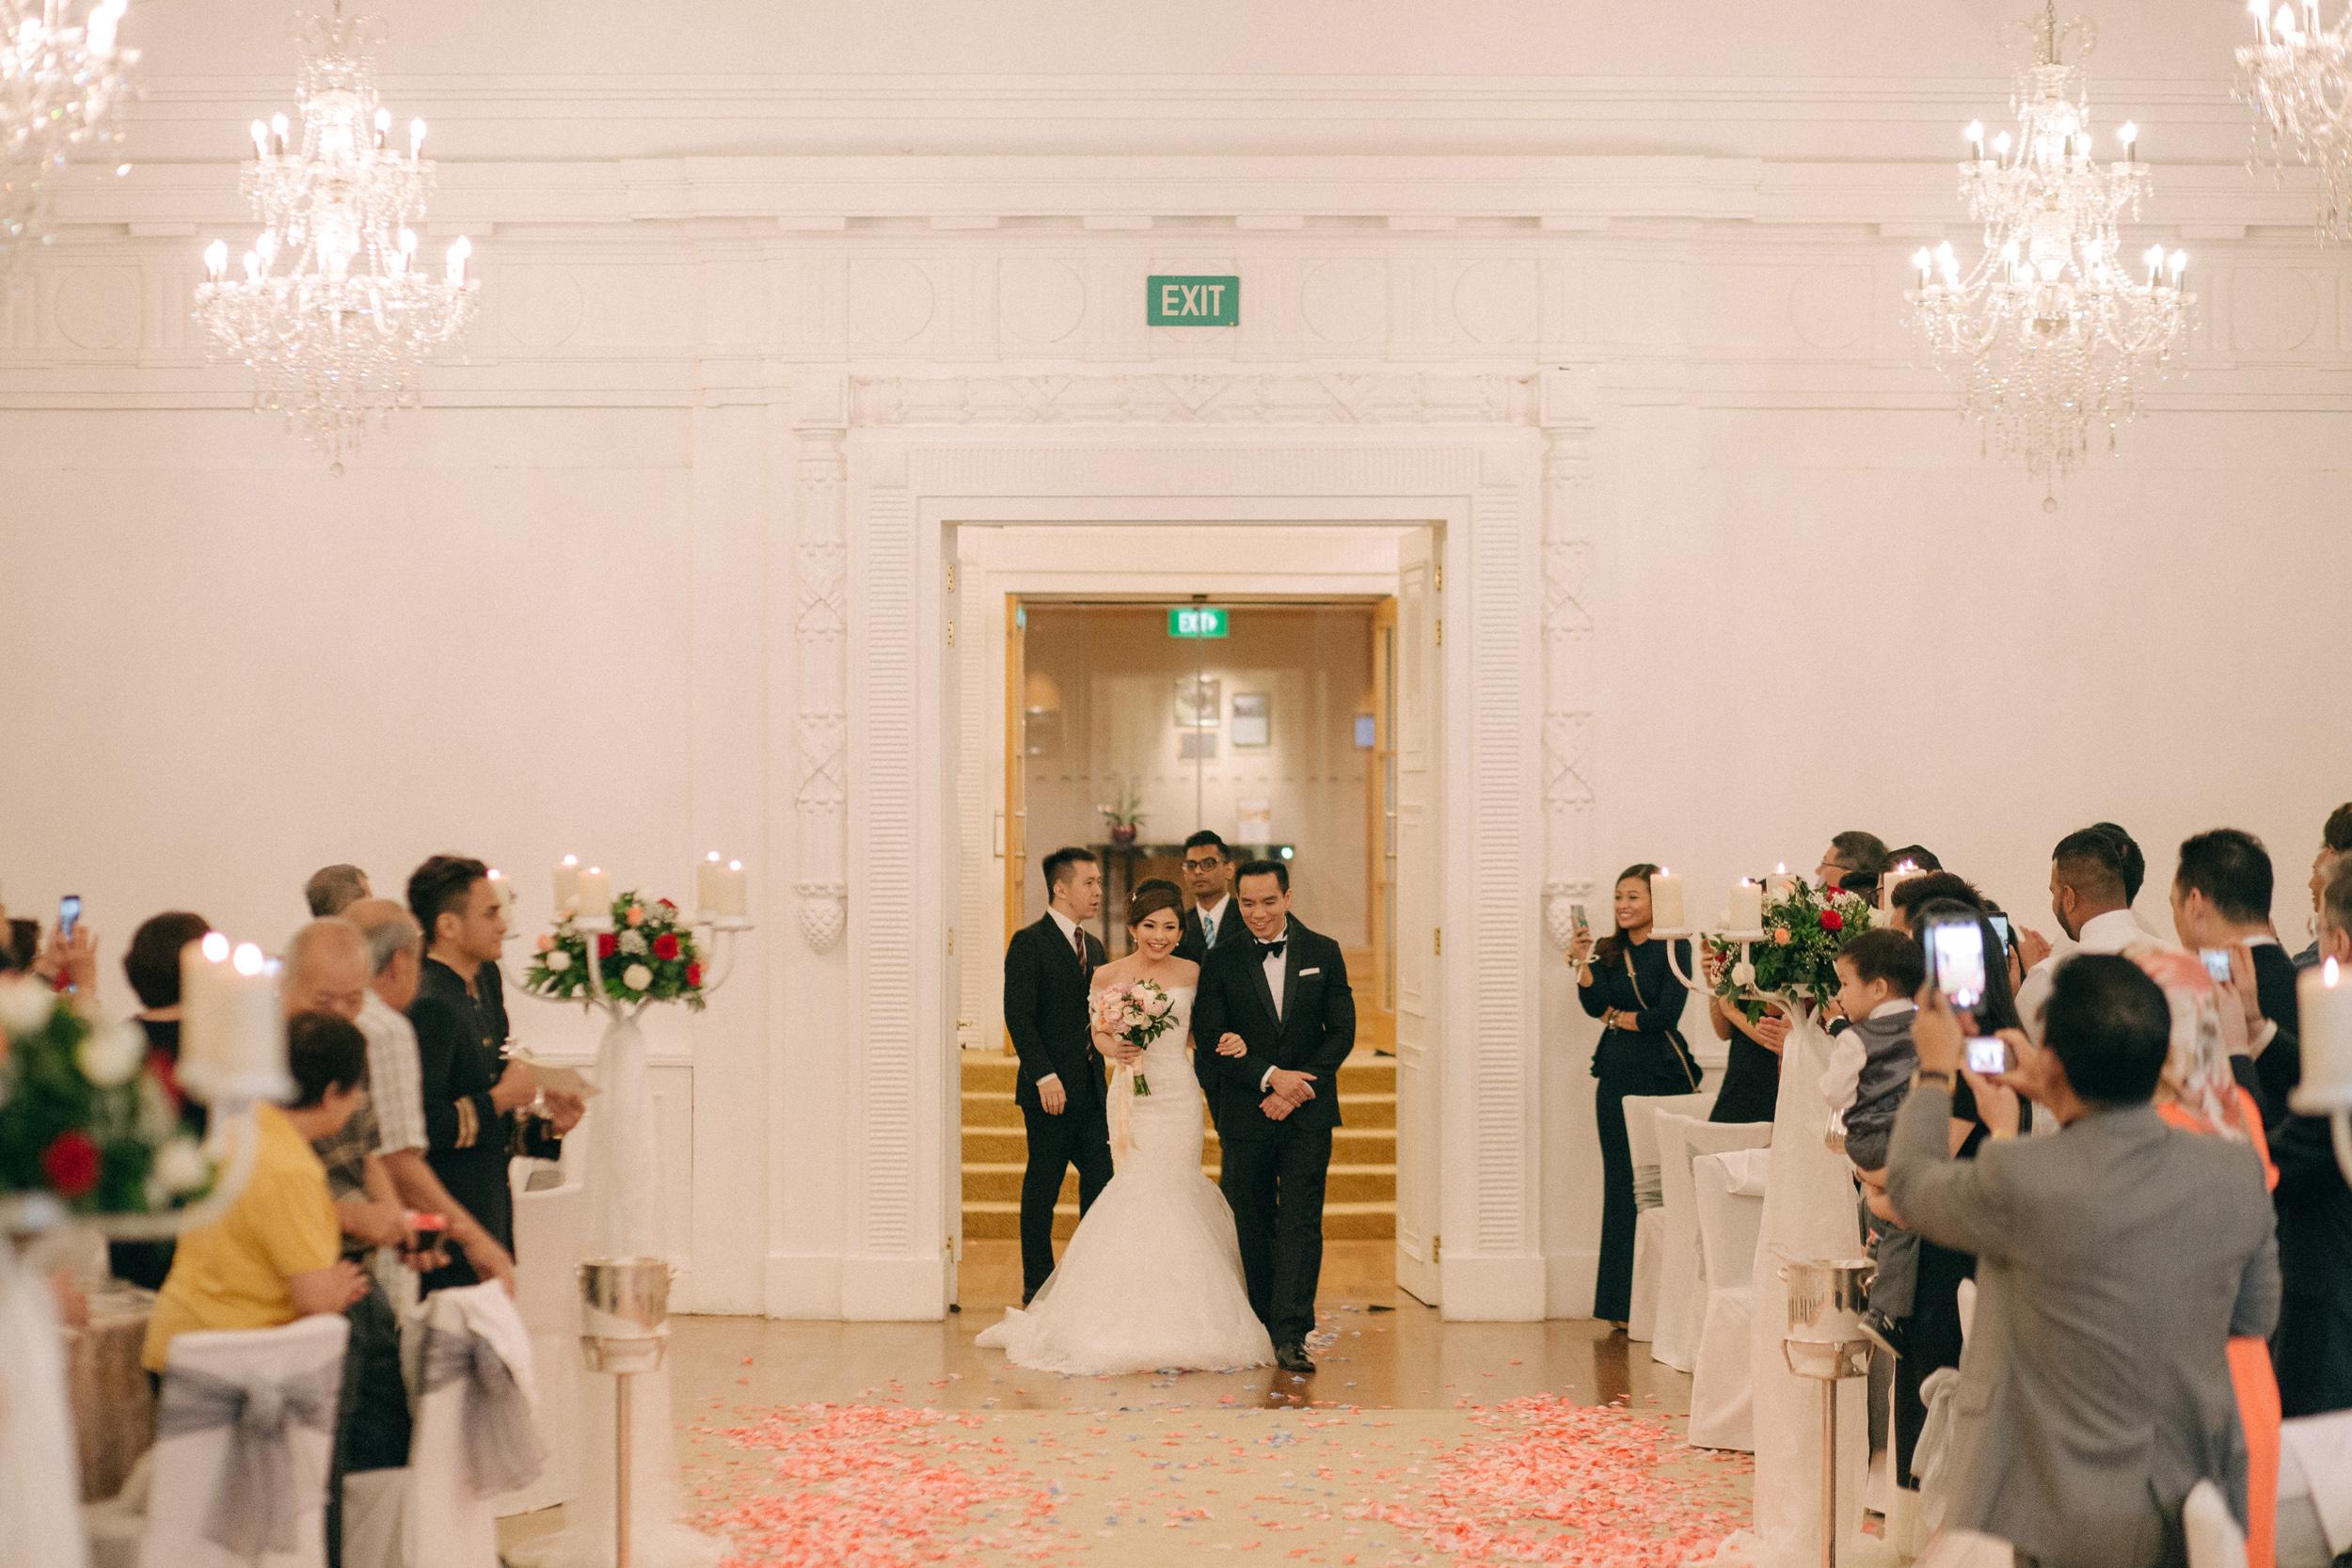 singapore-wedding-photographer-cheryl-matthew-fullerton-hotel-wedding-55.jpg